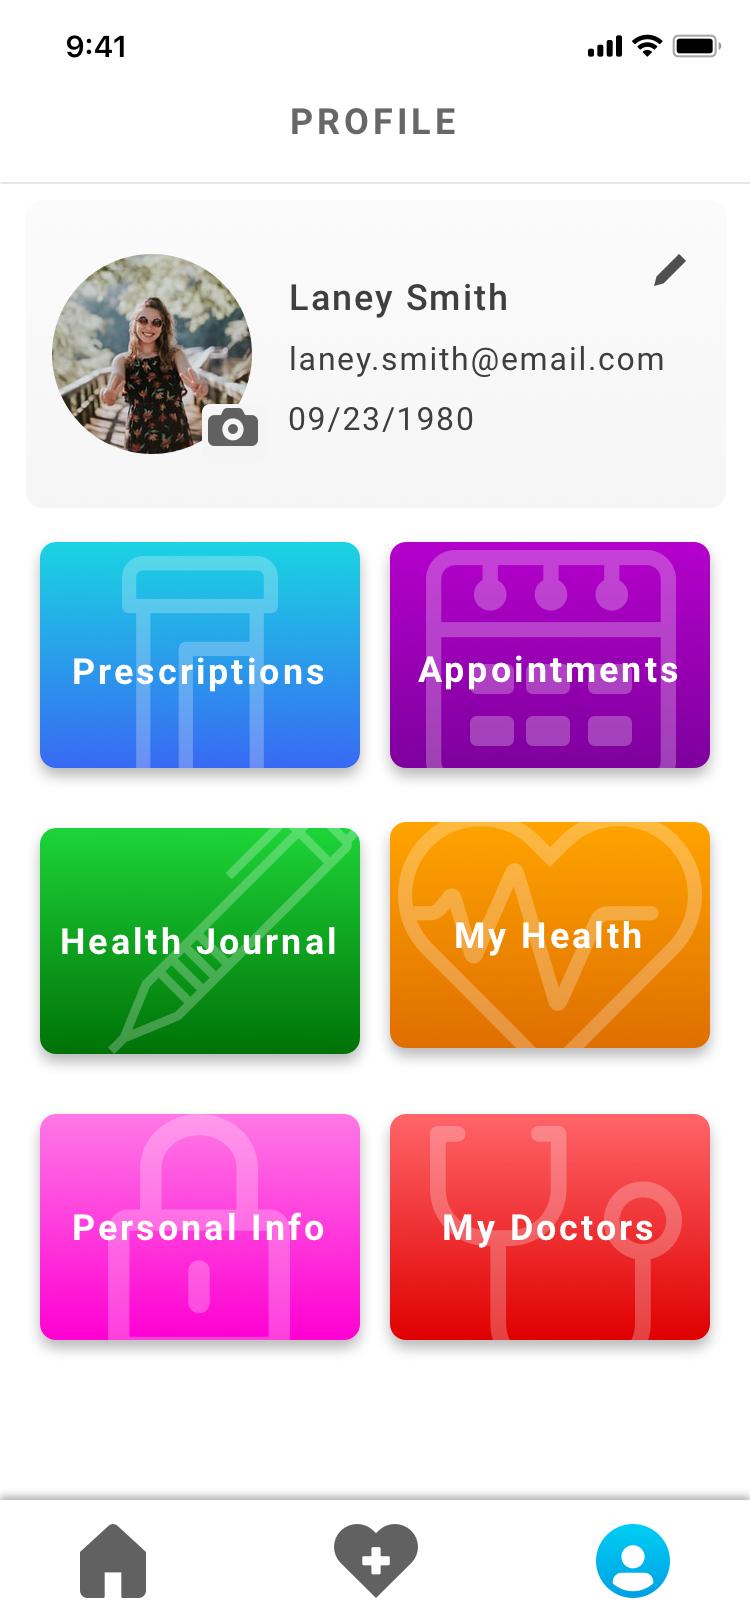 mhealth-mobile-app